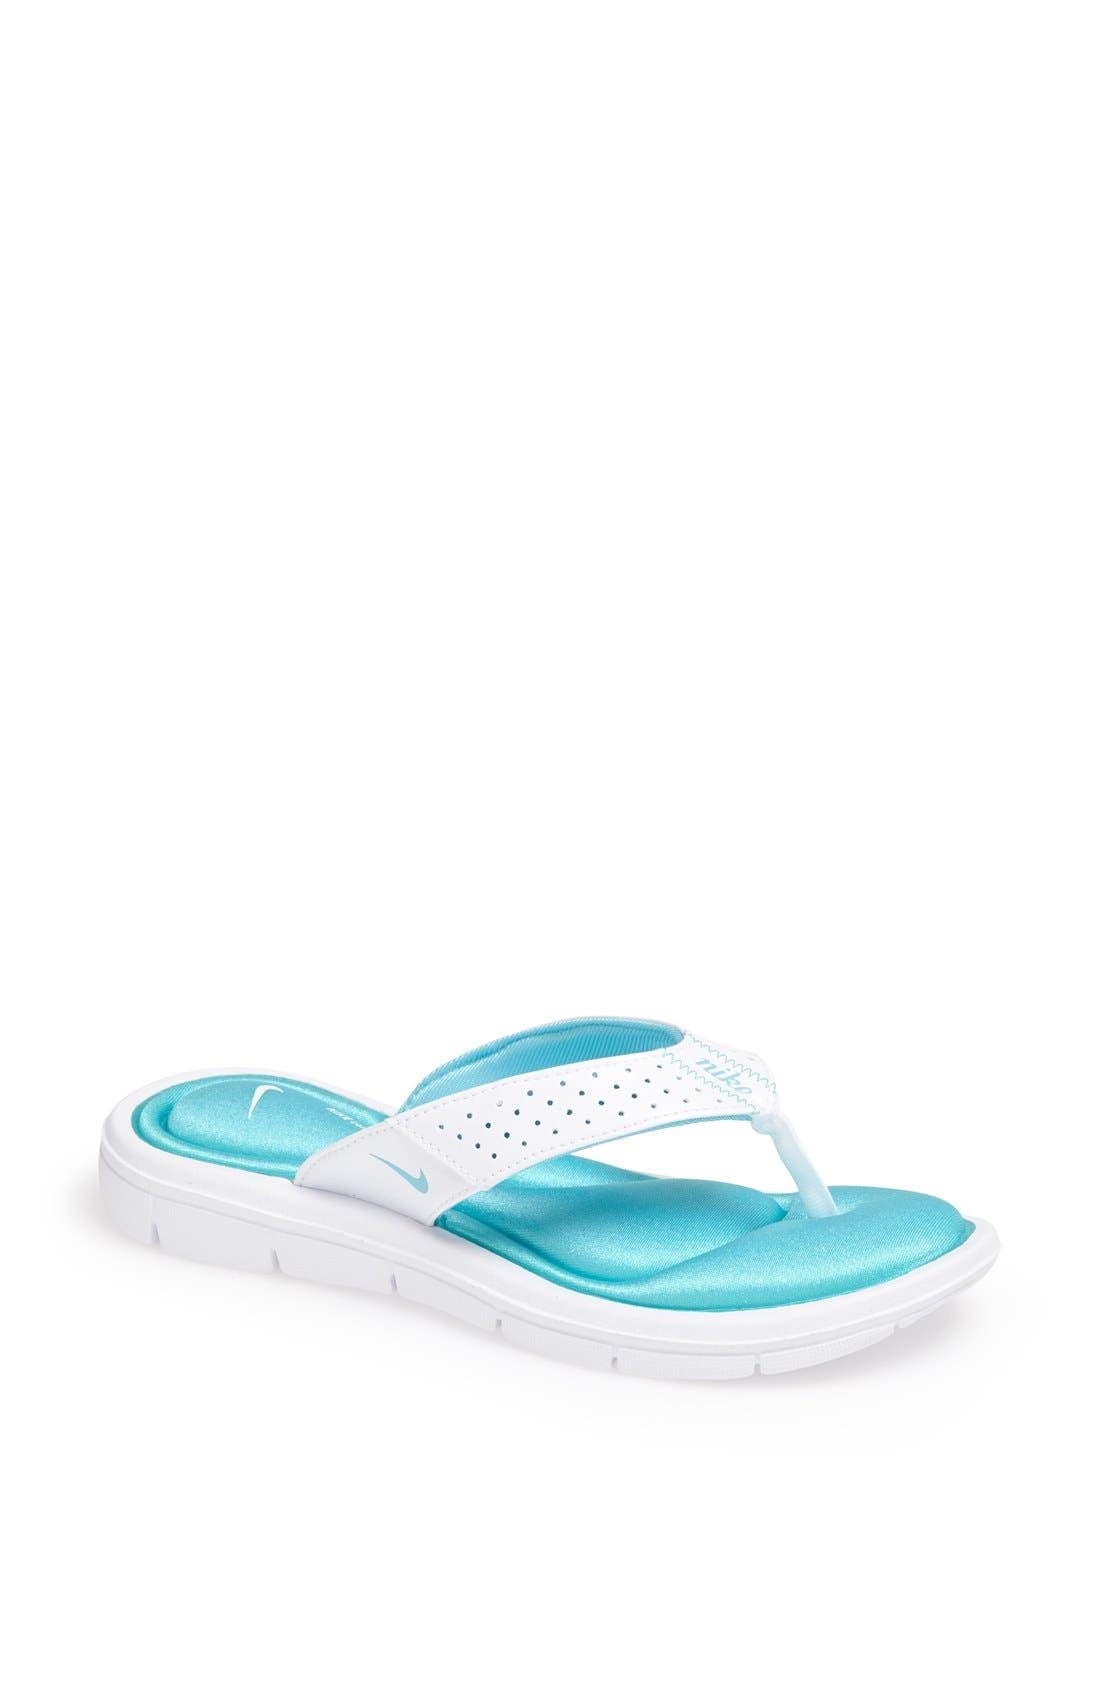 Alternate Image 1 Selected - Nike 'Comfort' Sandal (Women)